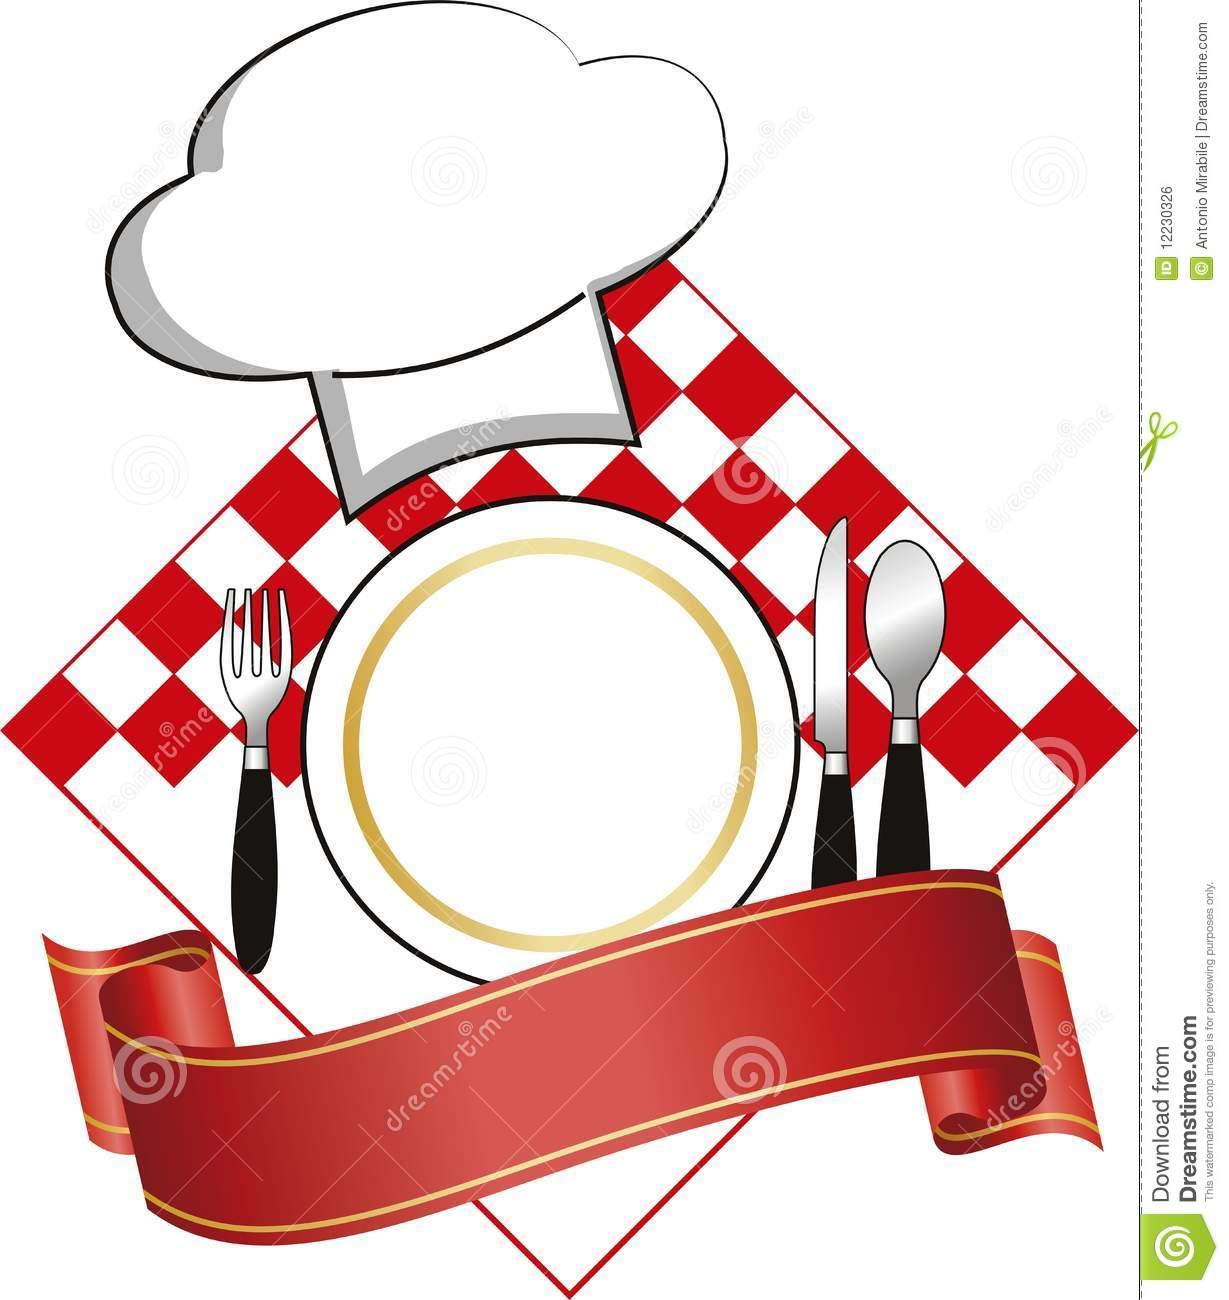 13 Restaurant Logo Graphics Images